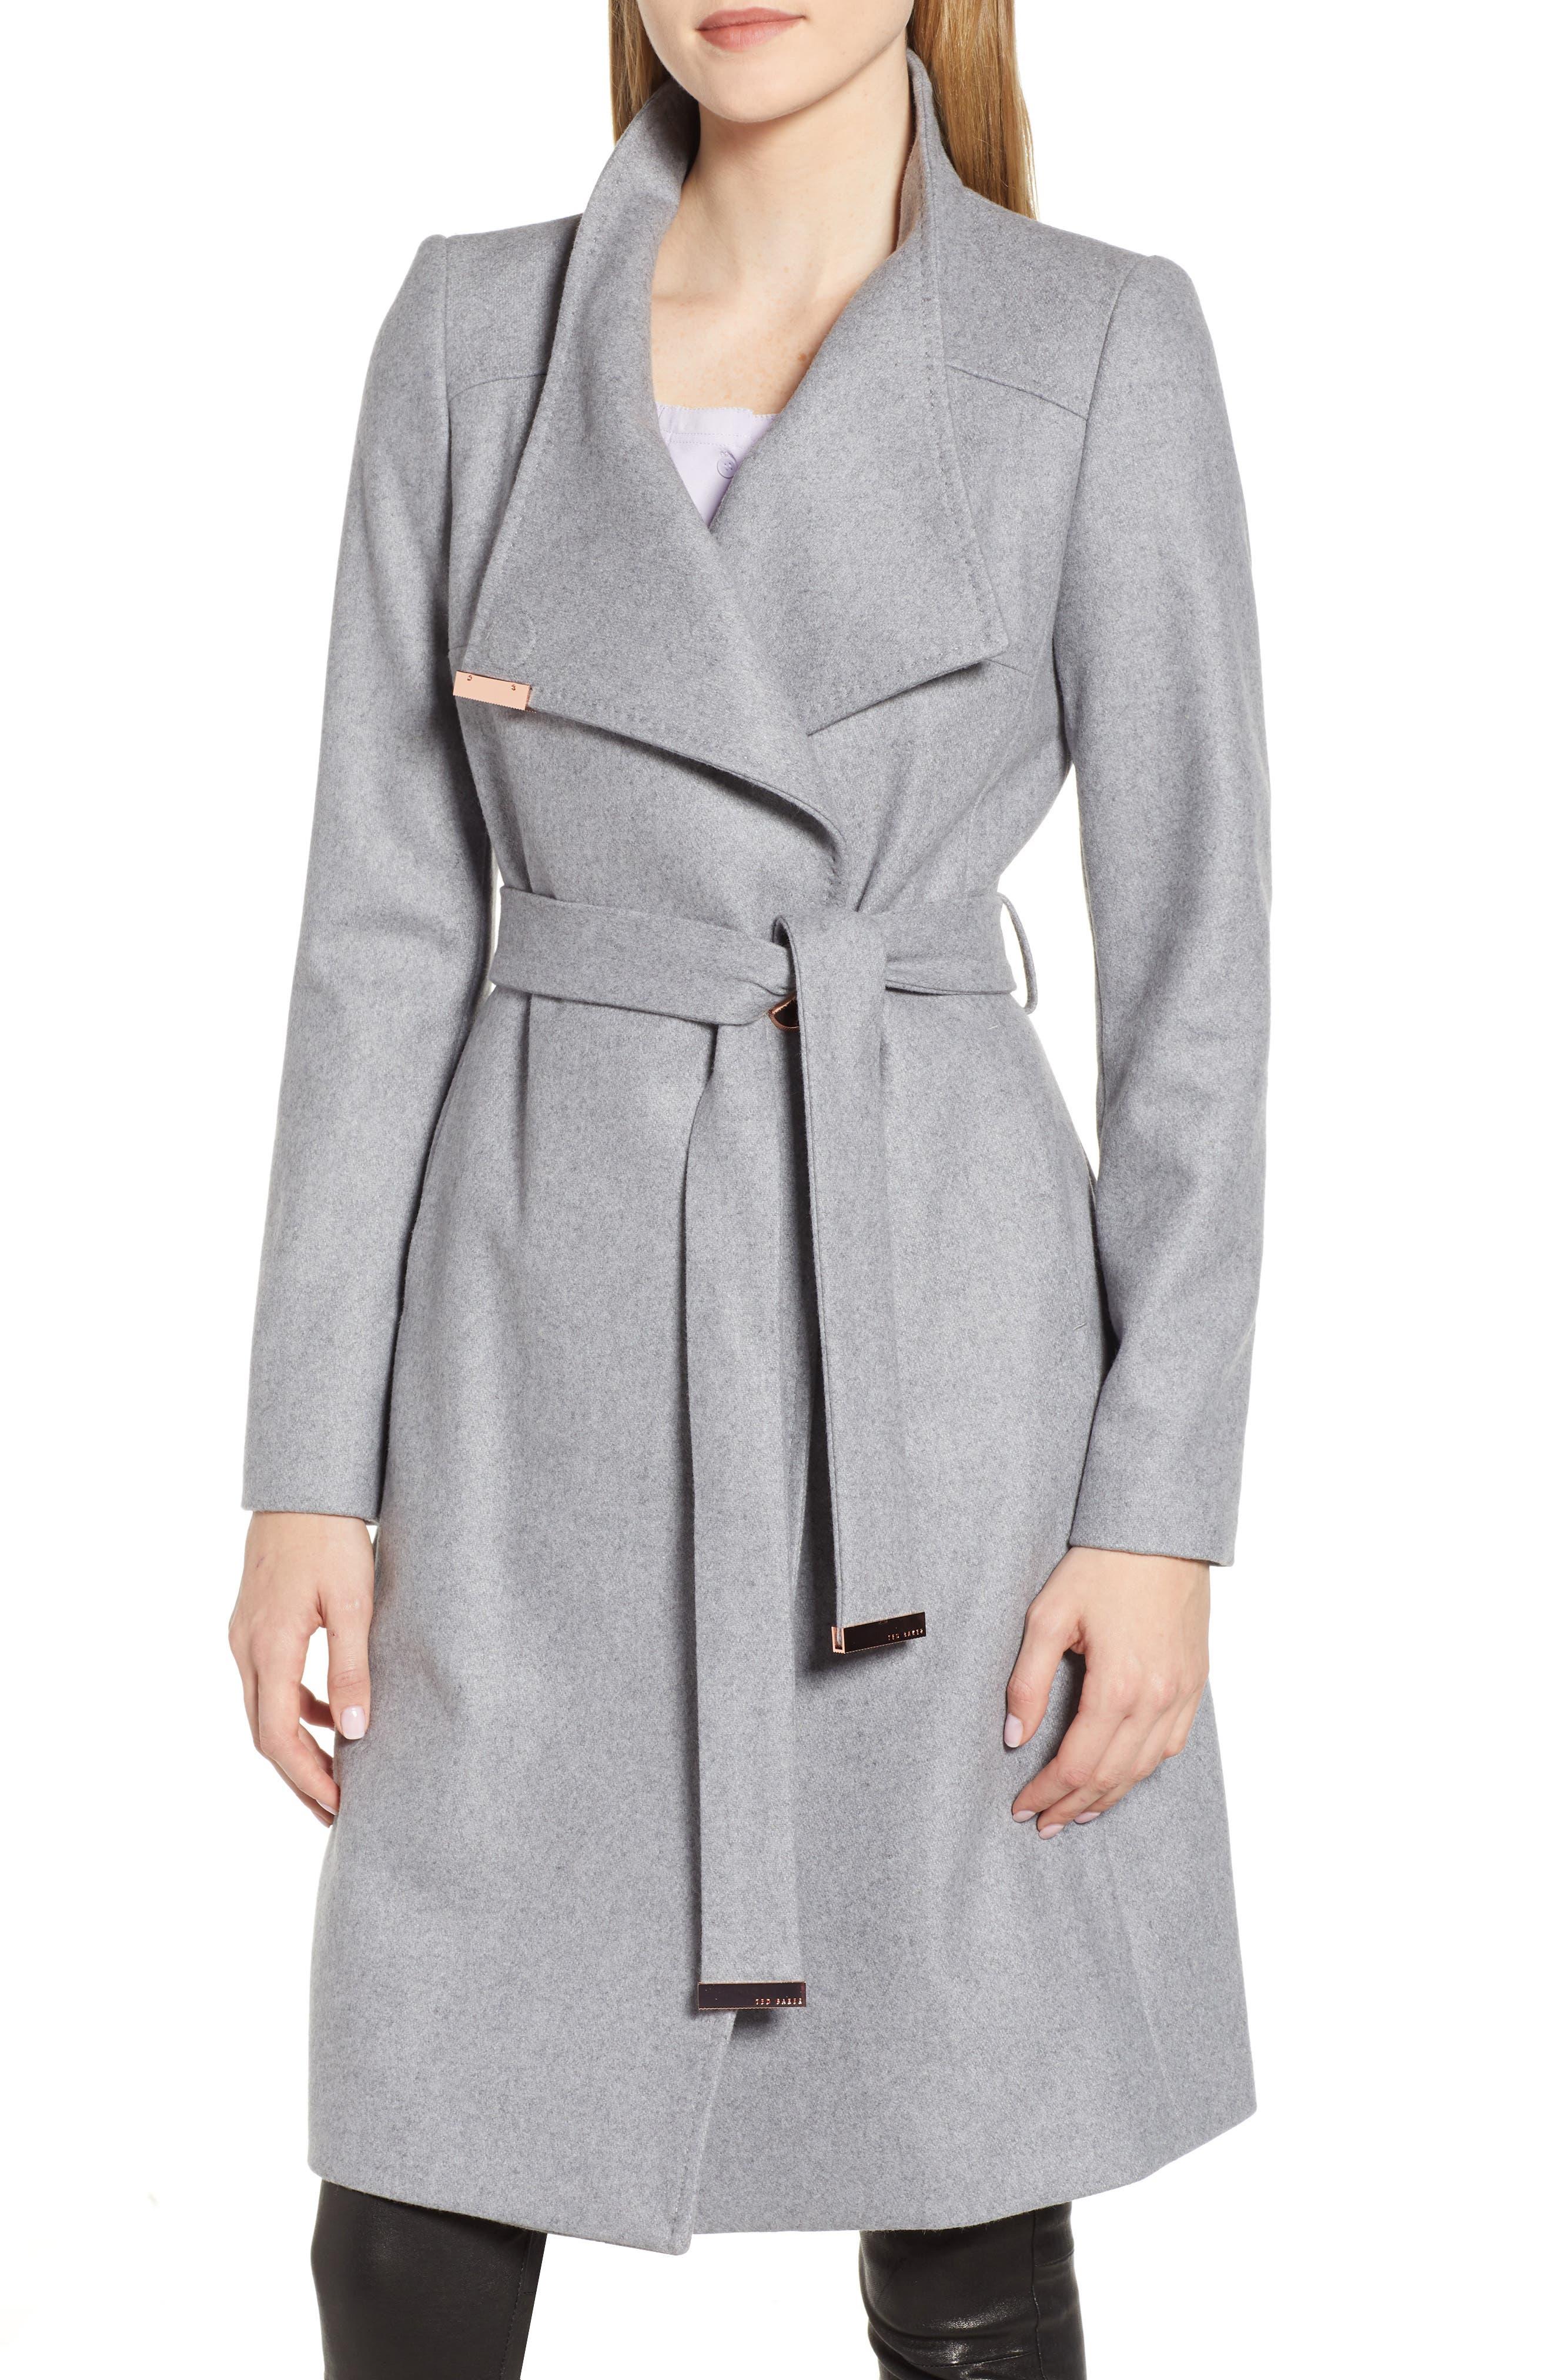 TED BAKER LONDON Wool Blend Long Wrap Coat, Main, color, 030